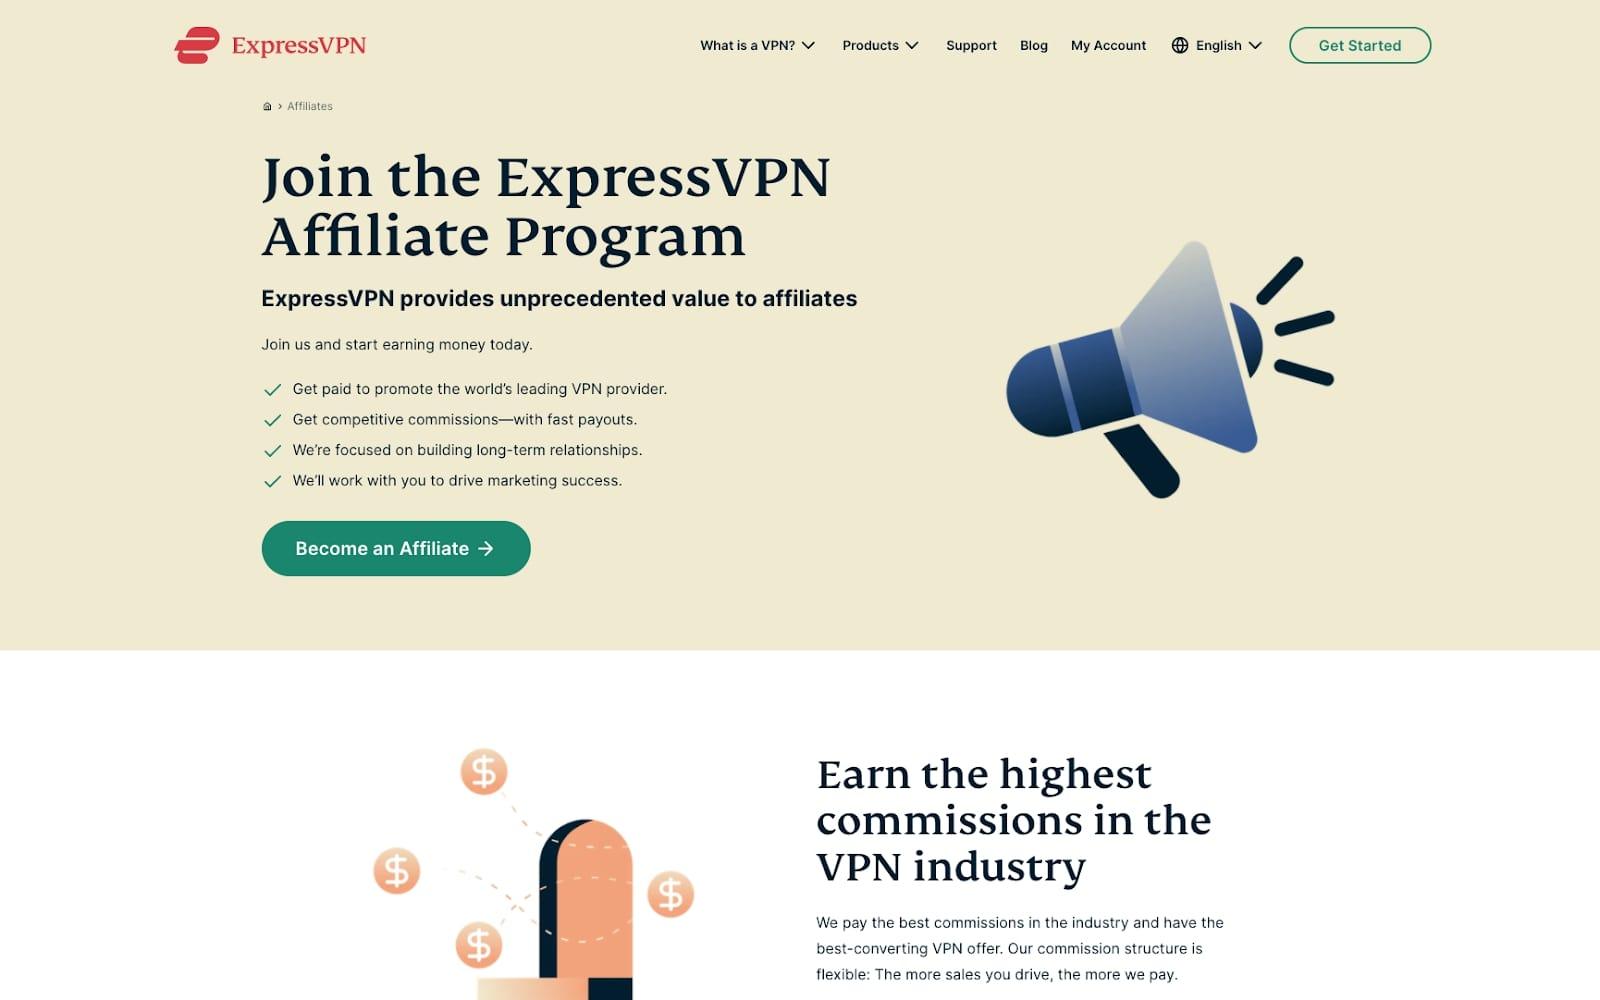 Screenshot of ExpressVPN affiliate program website